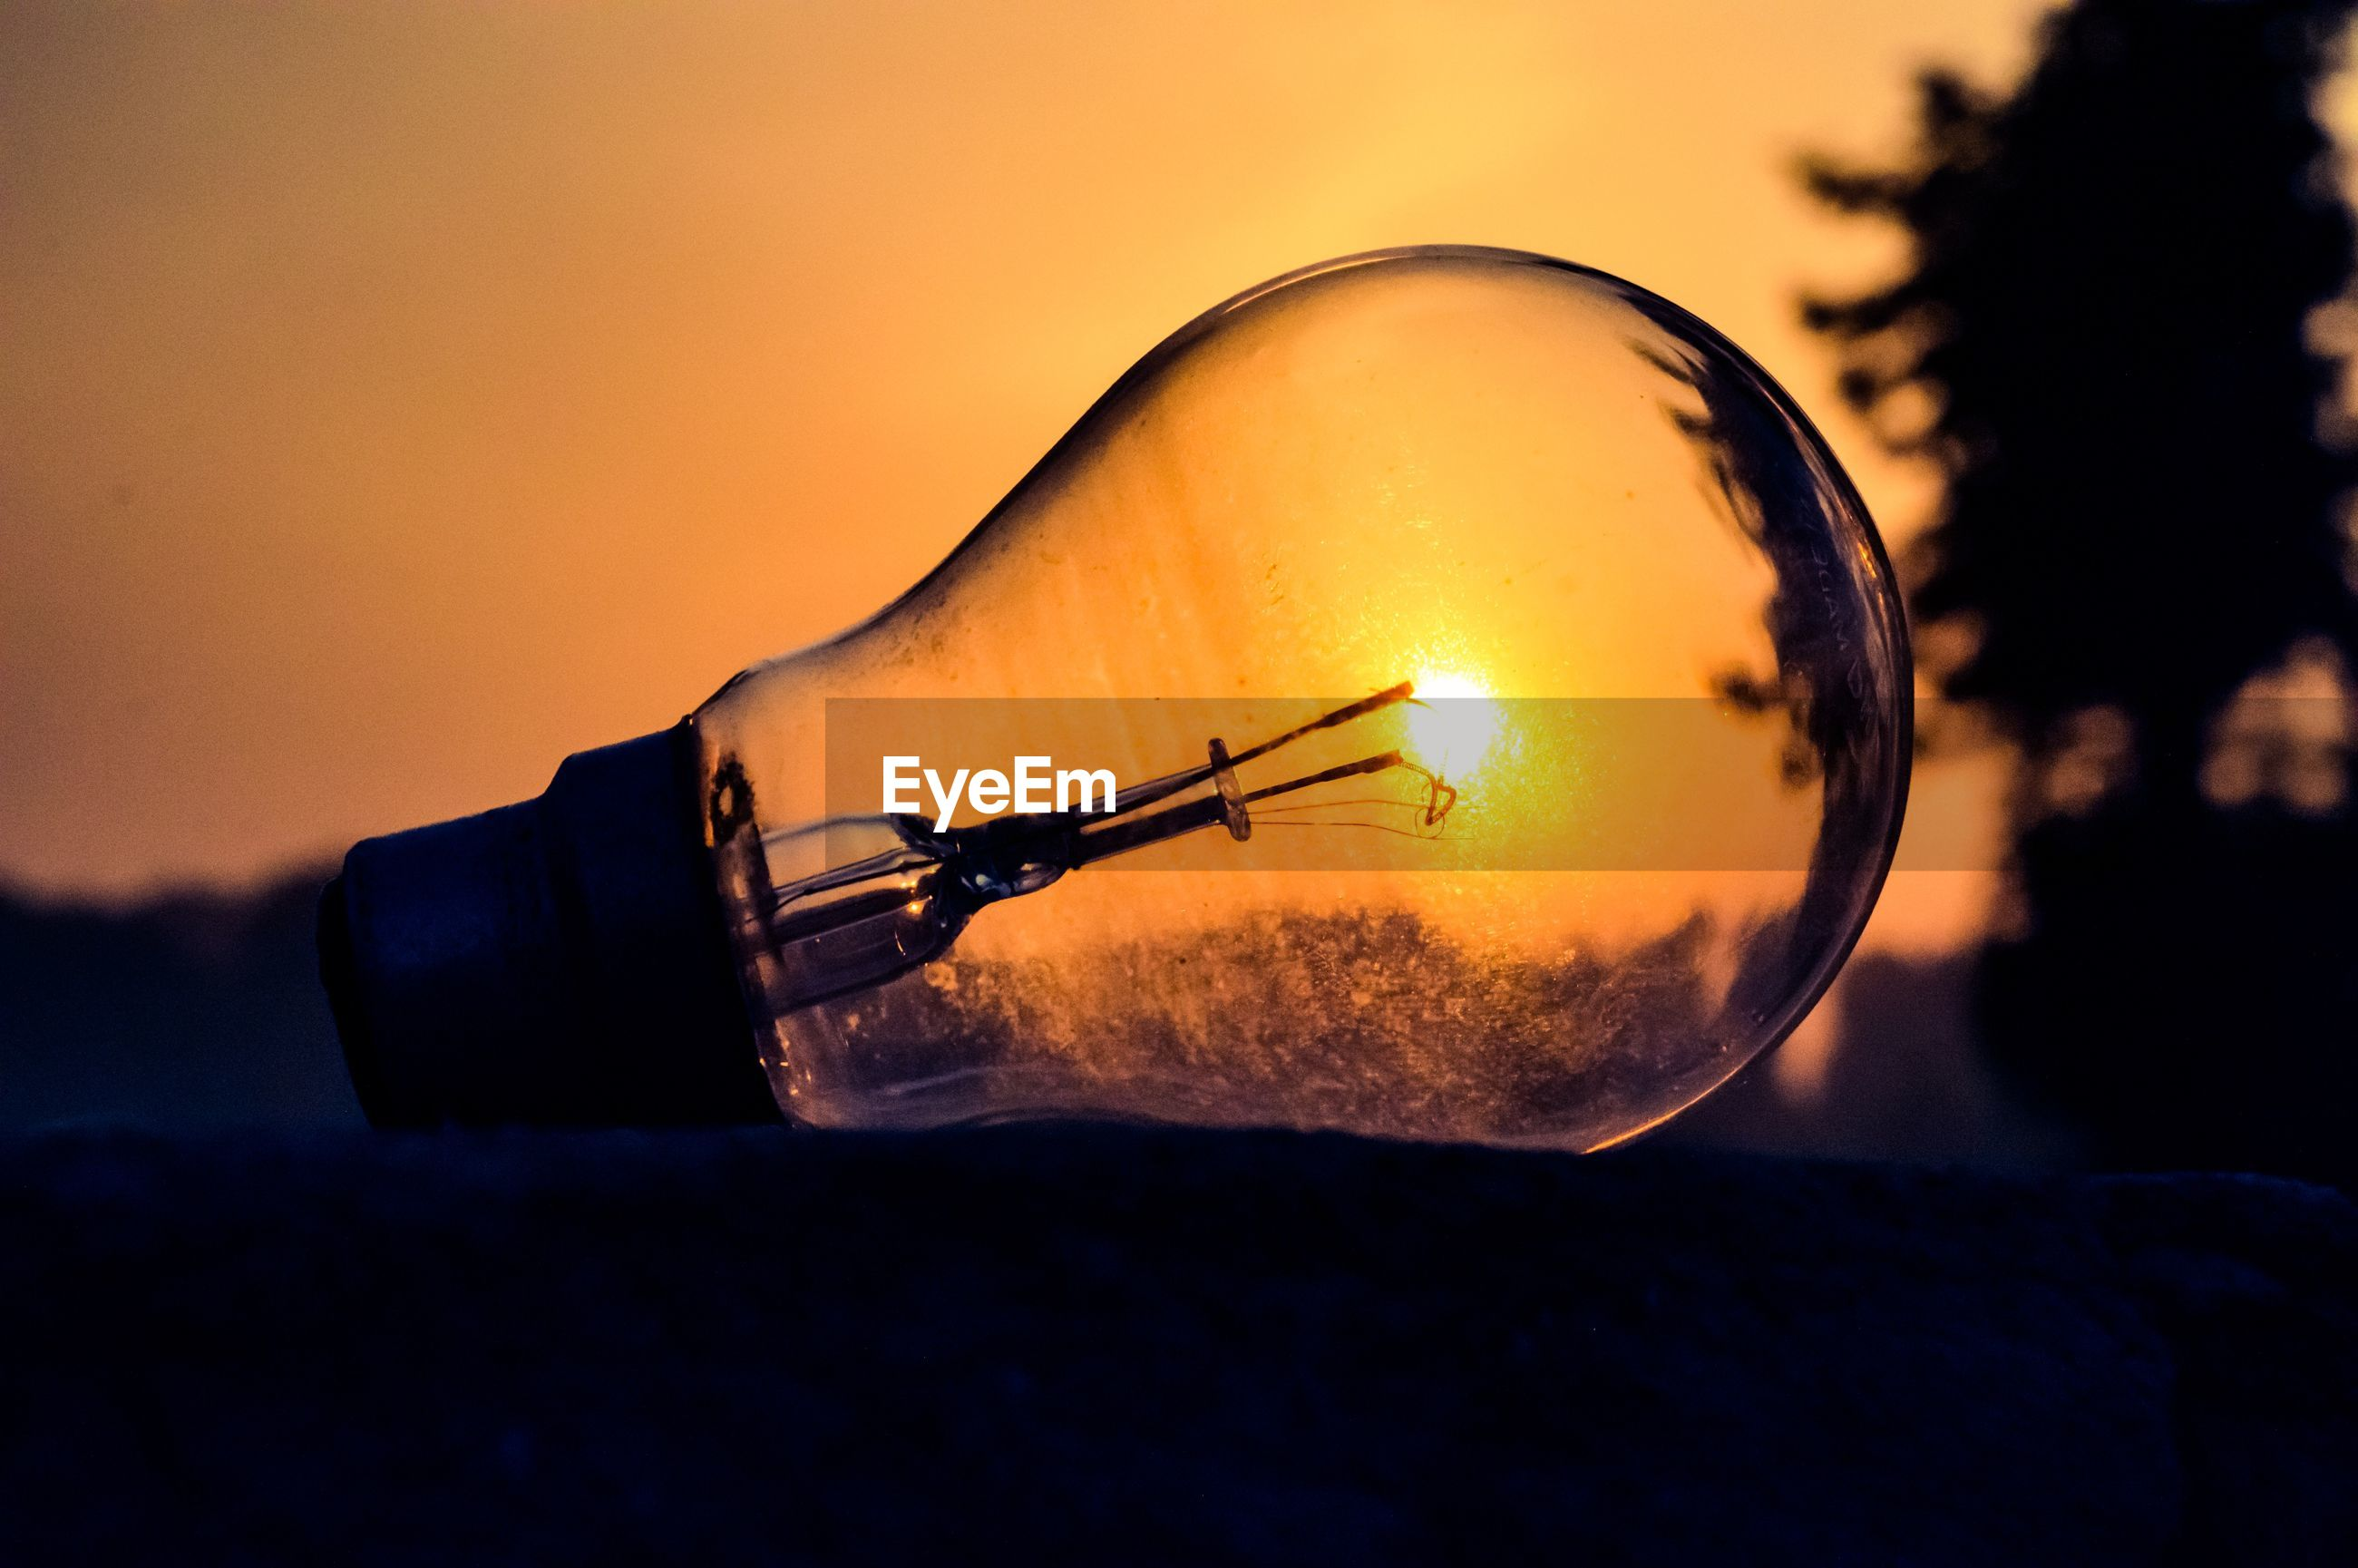 Close-up of illuminated light bulb against sky at sunset